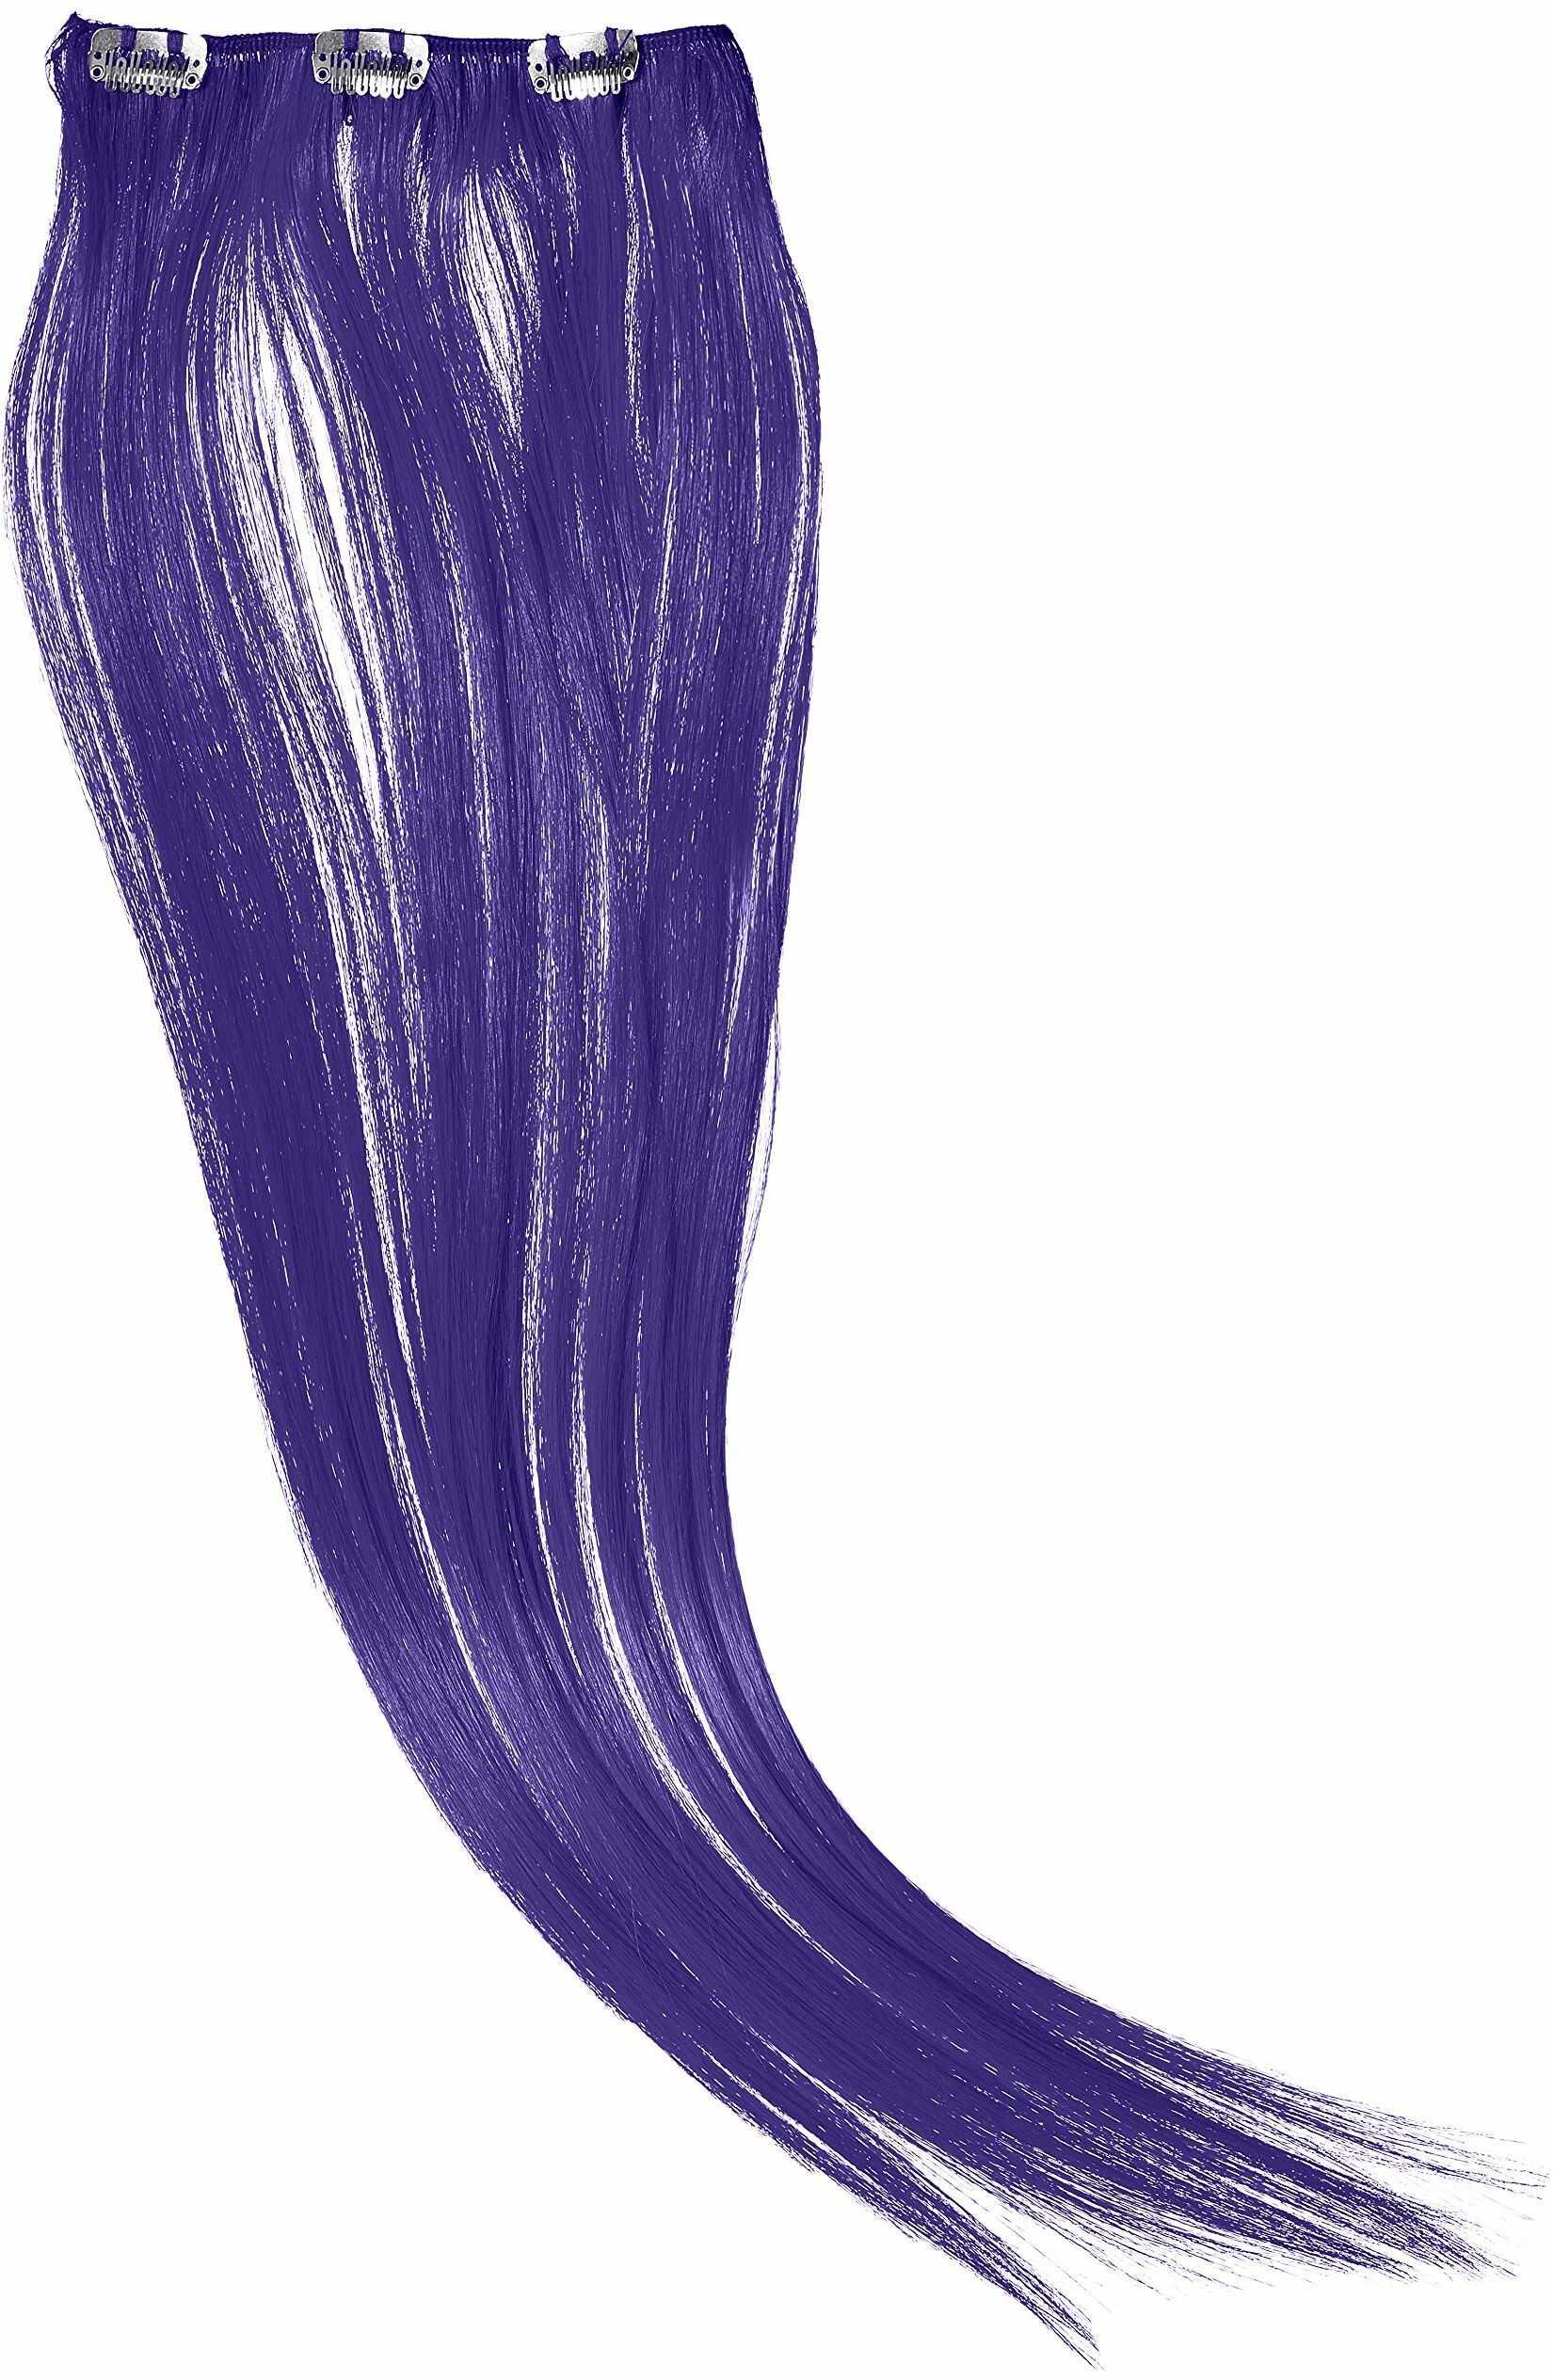 Hairaisers Clip and Go Extensions, 45 cm sztuczne włosy, lawendy, 1 sztuka